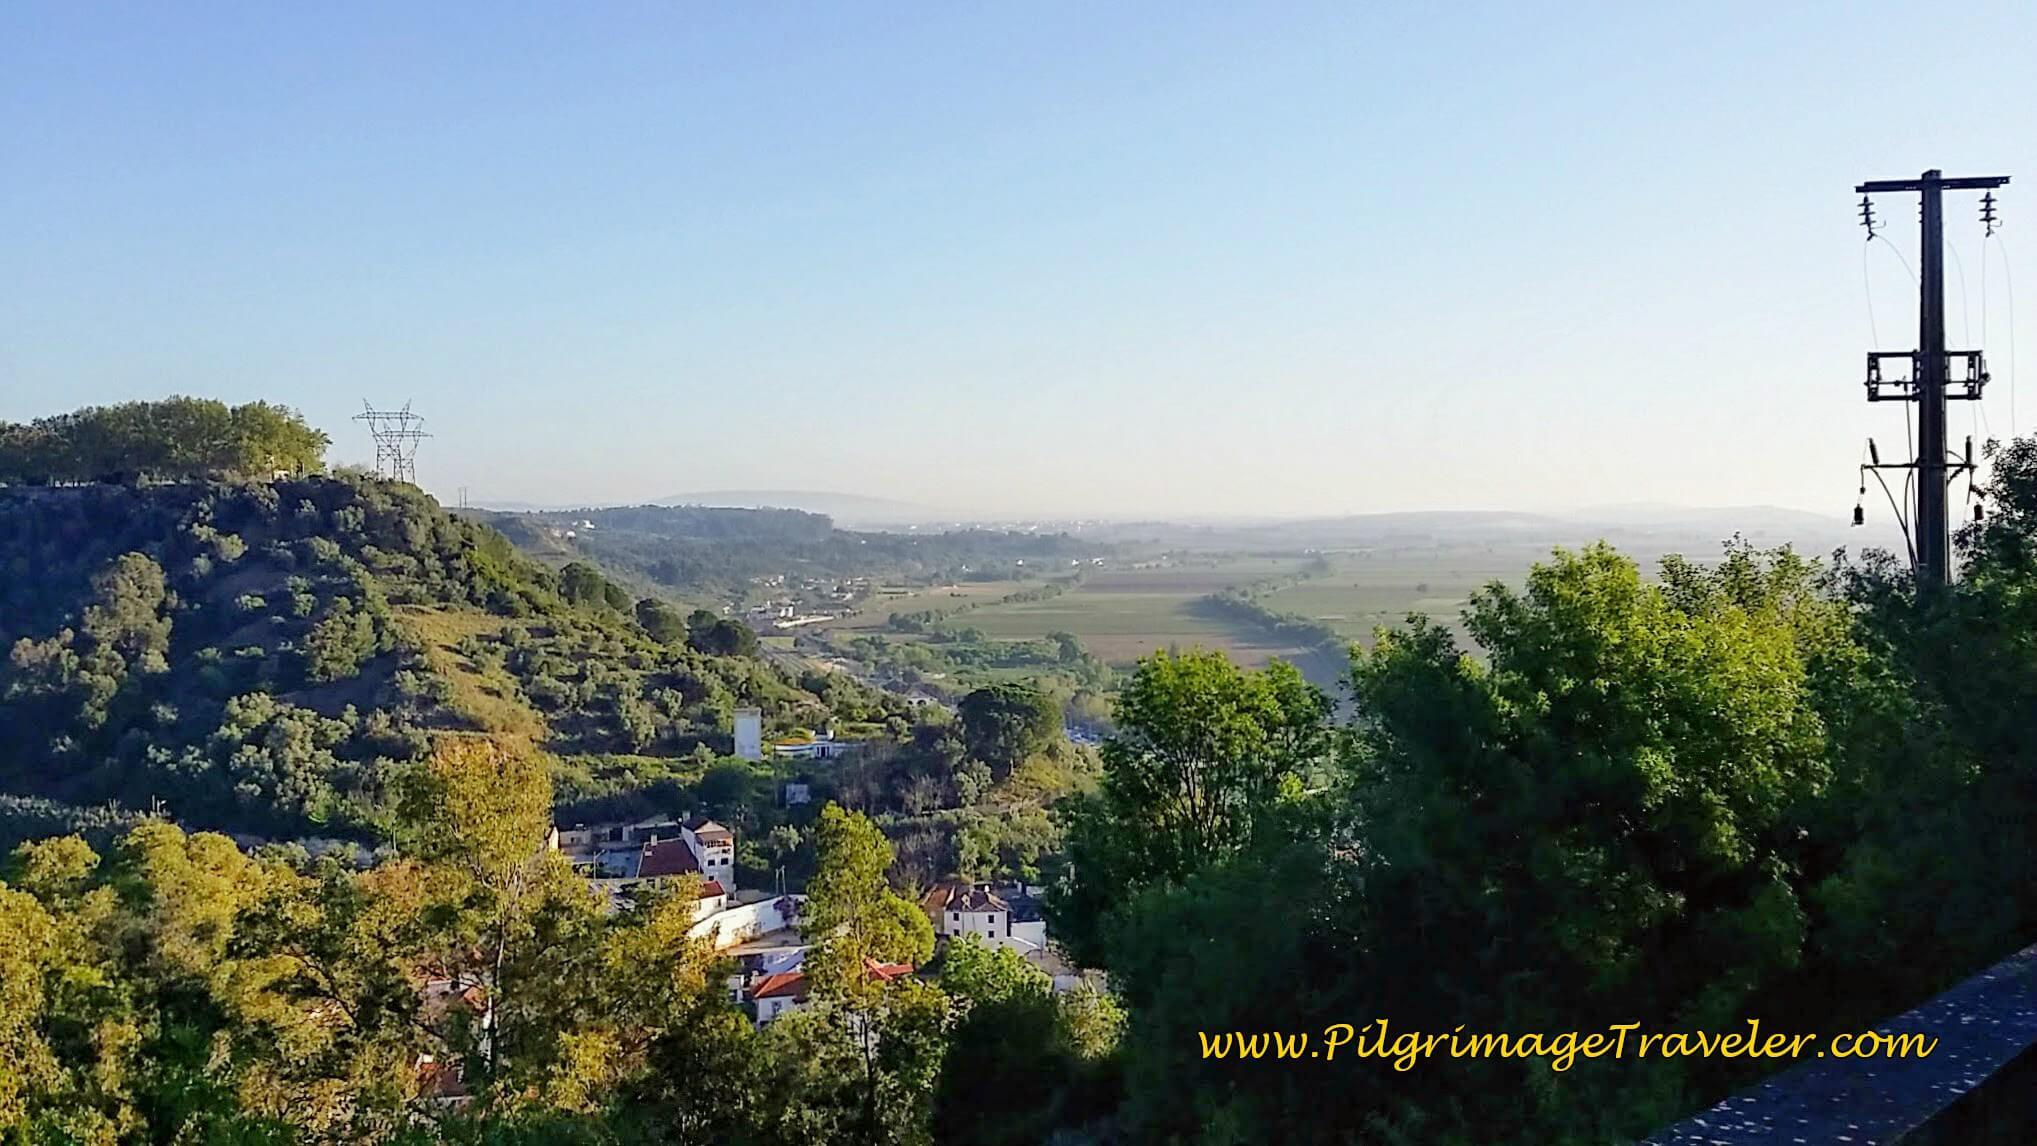 Valley Views from the Hilltop of Santarém